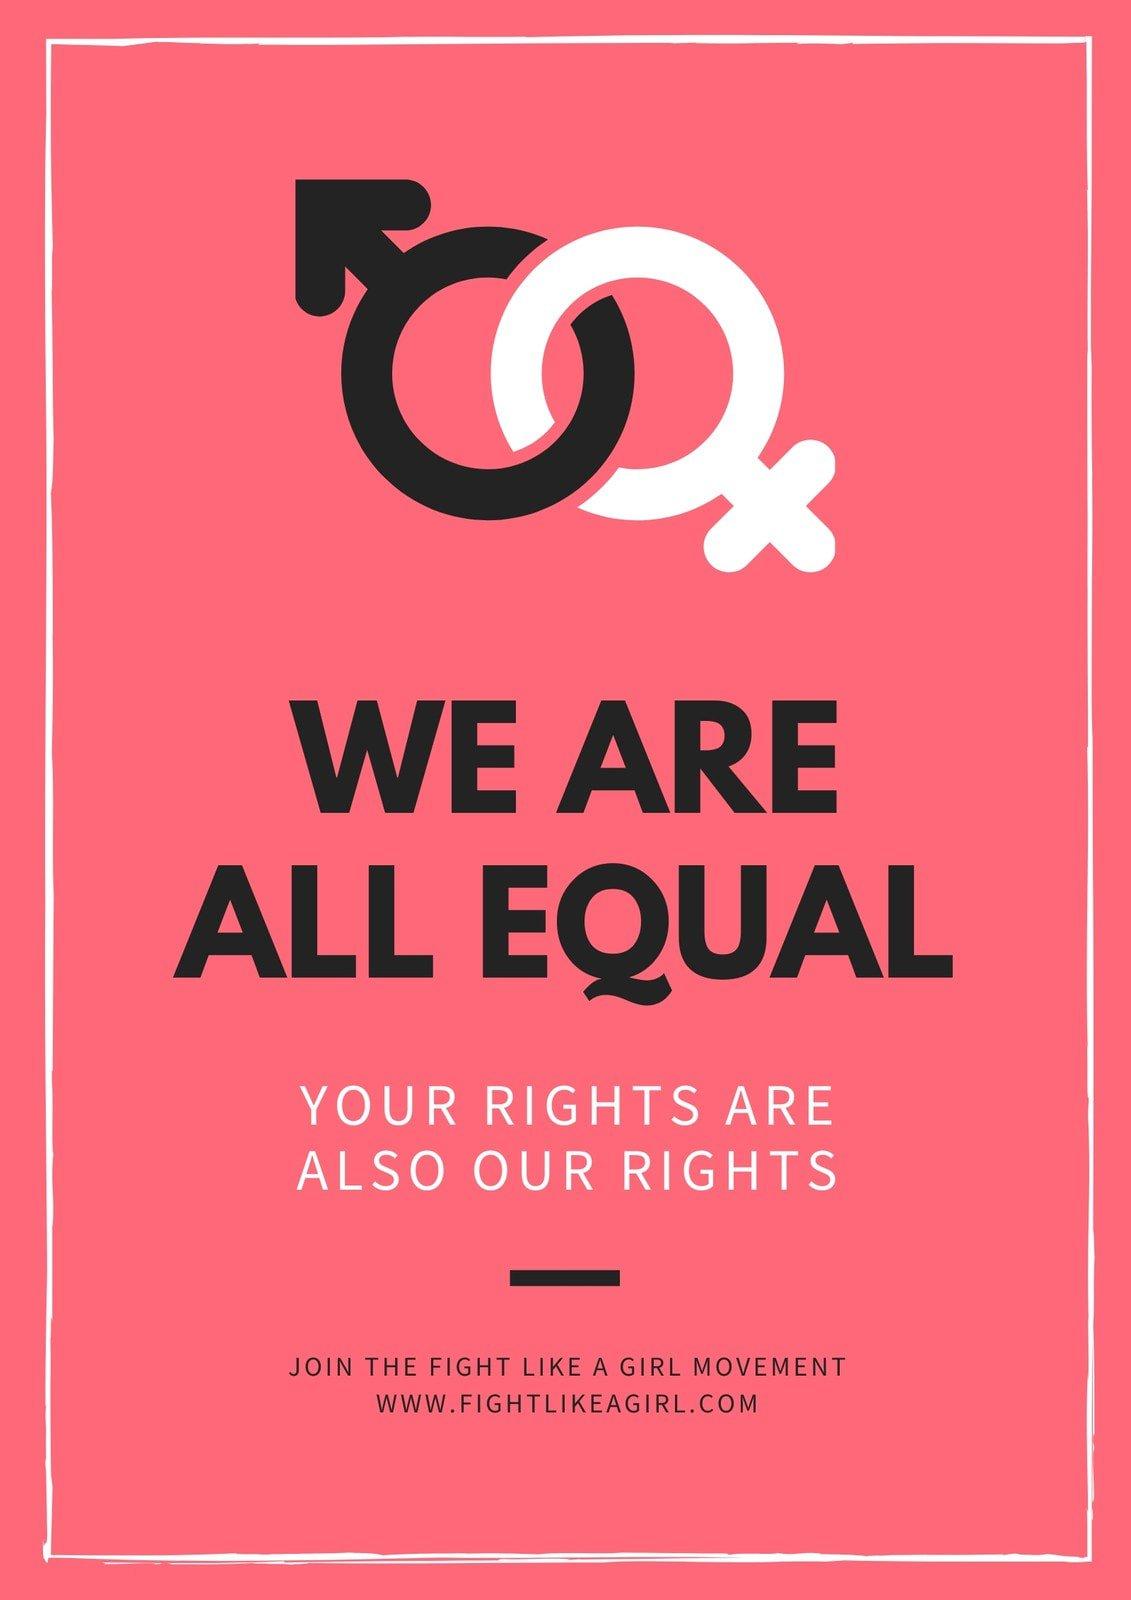 Pink Salmon Gender Icons Gender Equality Poster